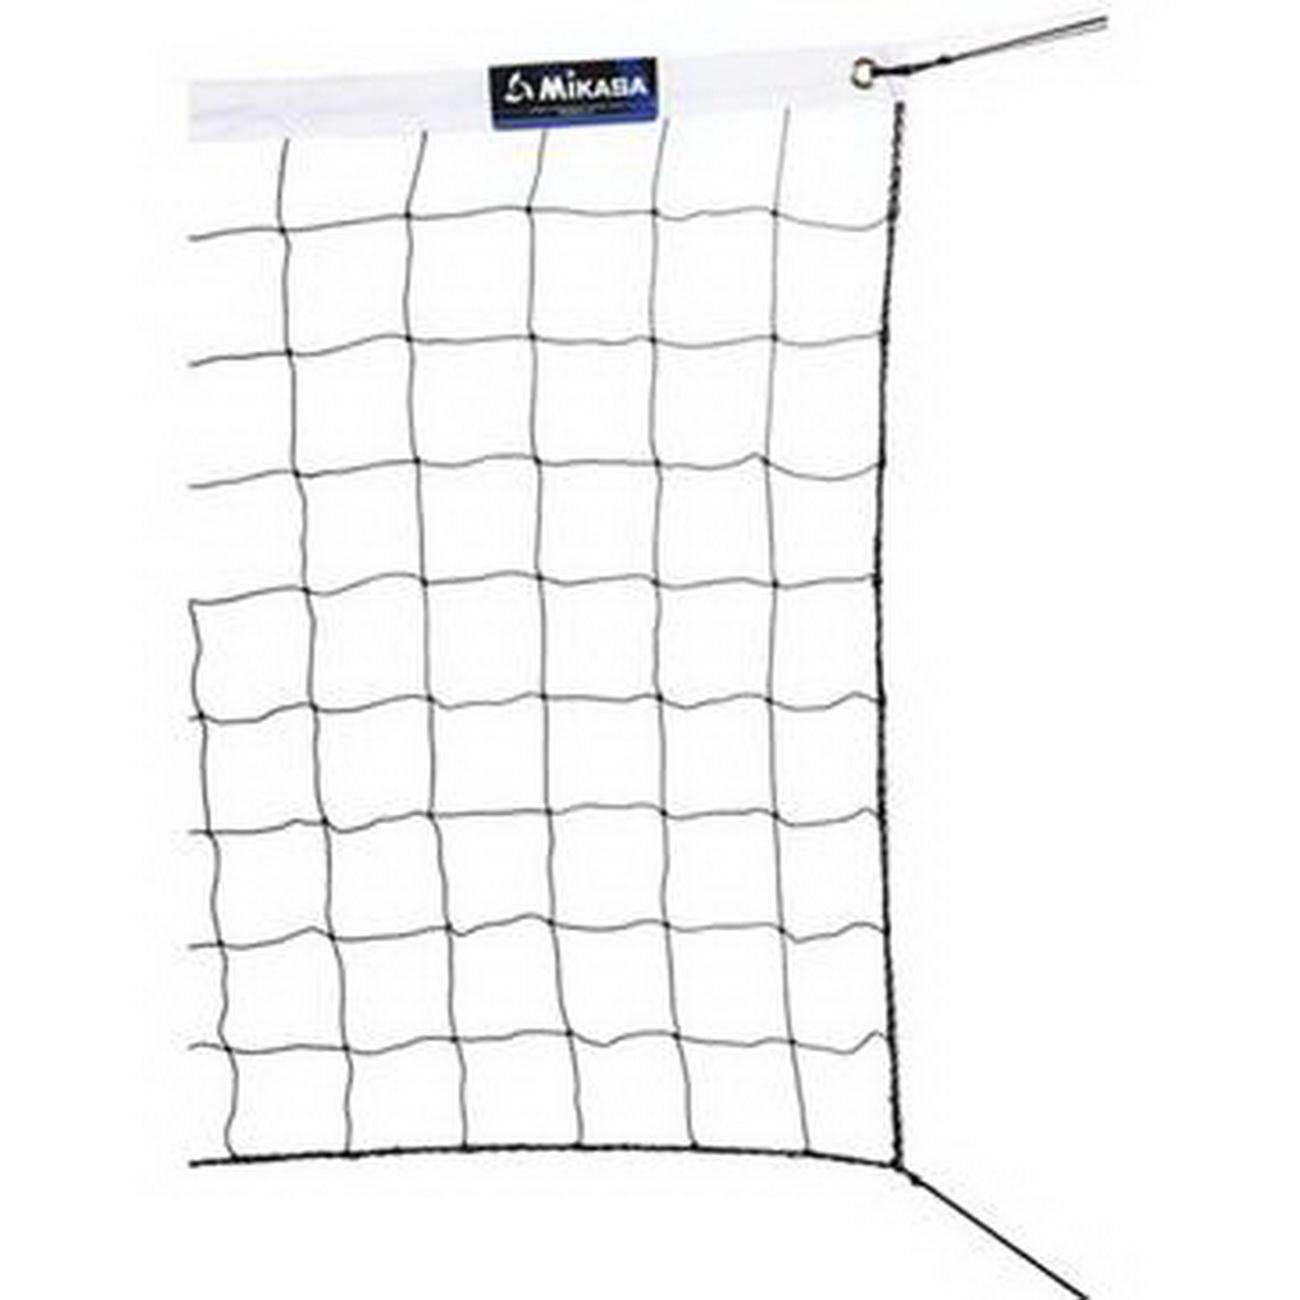 Mikasa Volleyball Net 32' x 3'